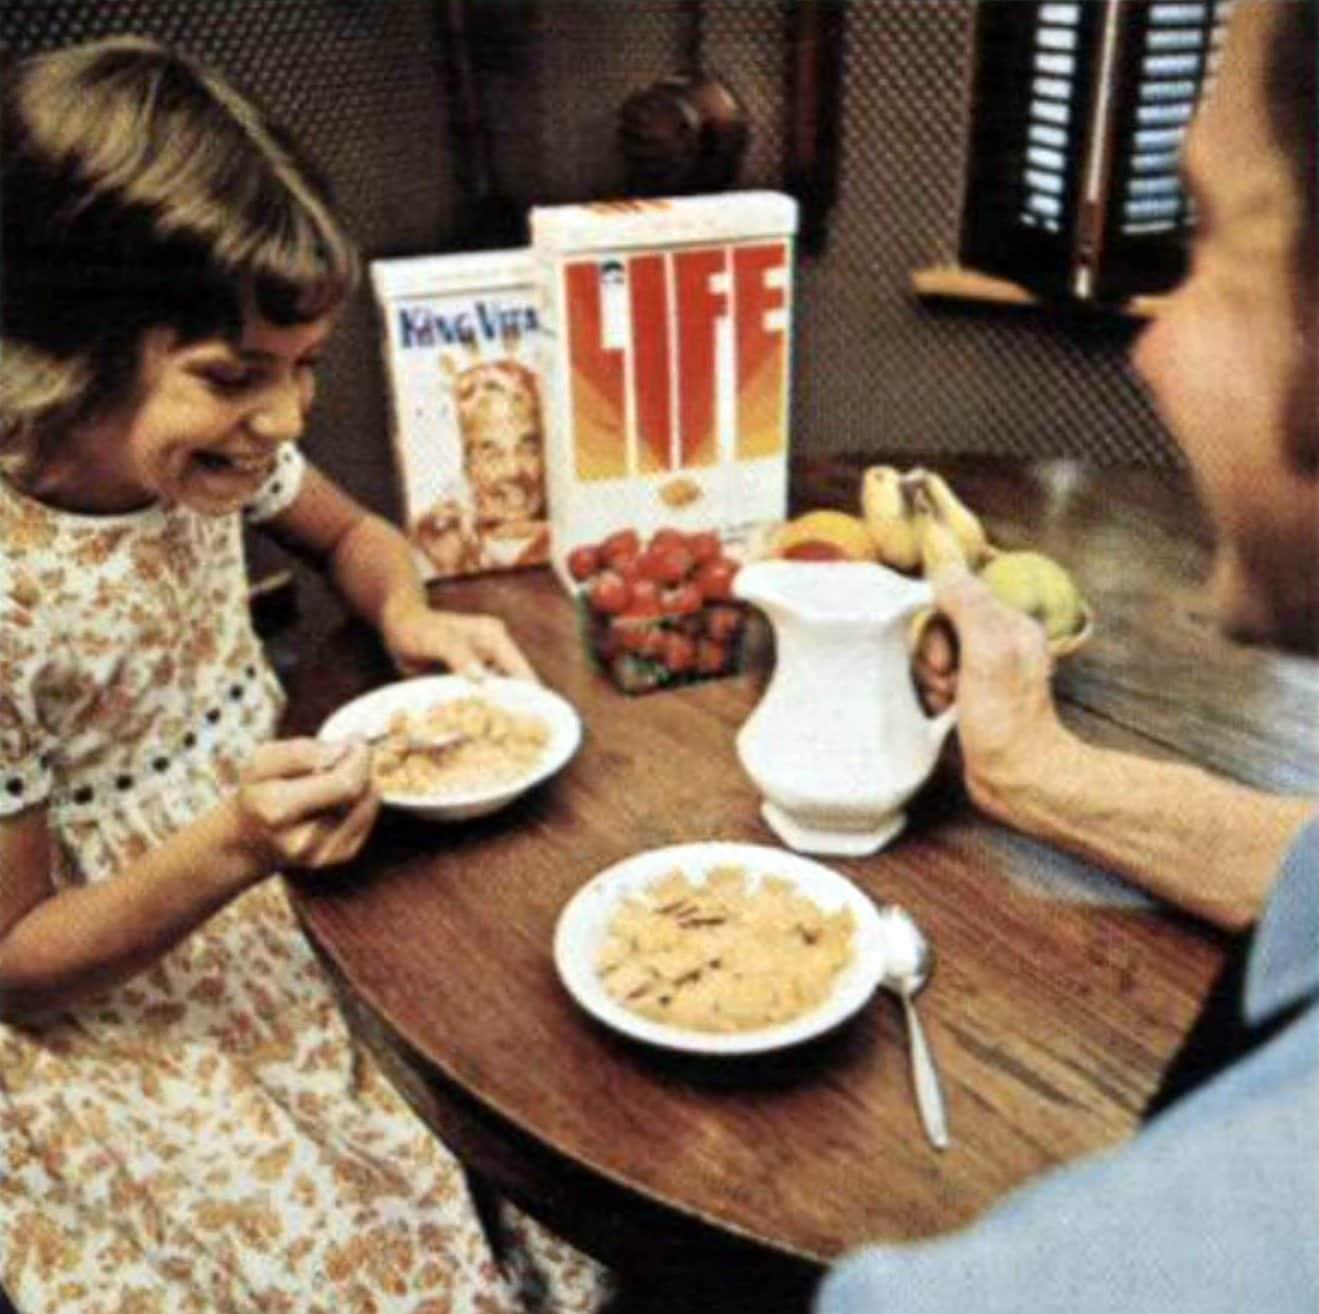 Vintage Quaker Life cereal and King Vitaman (1972)